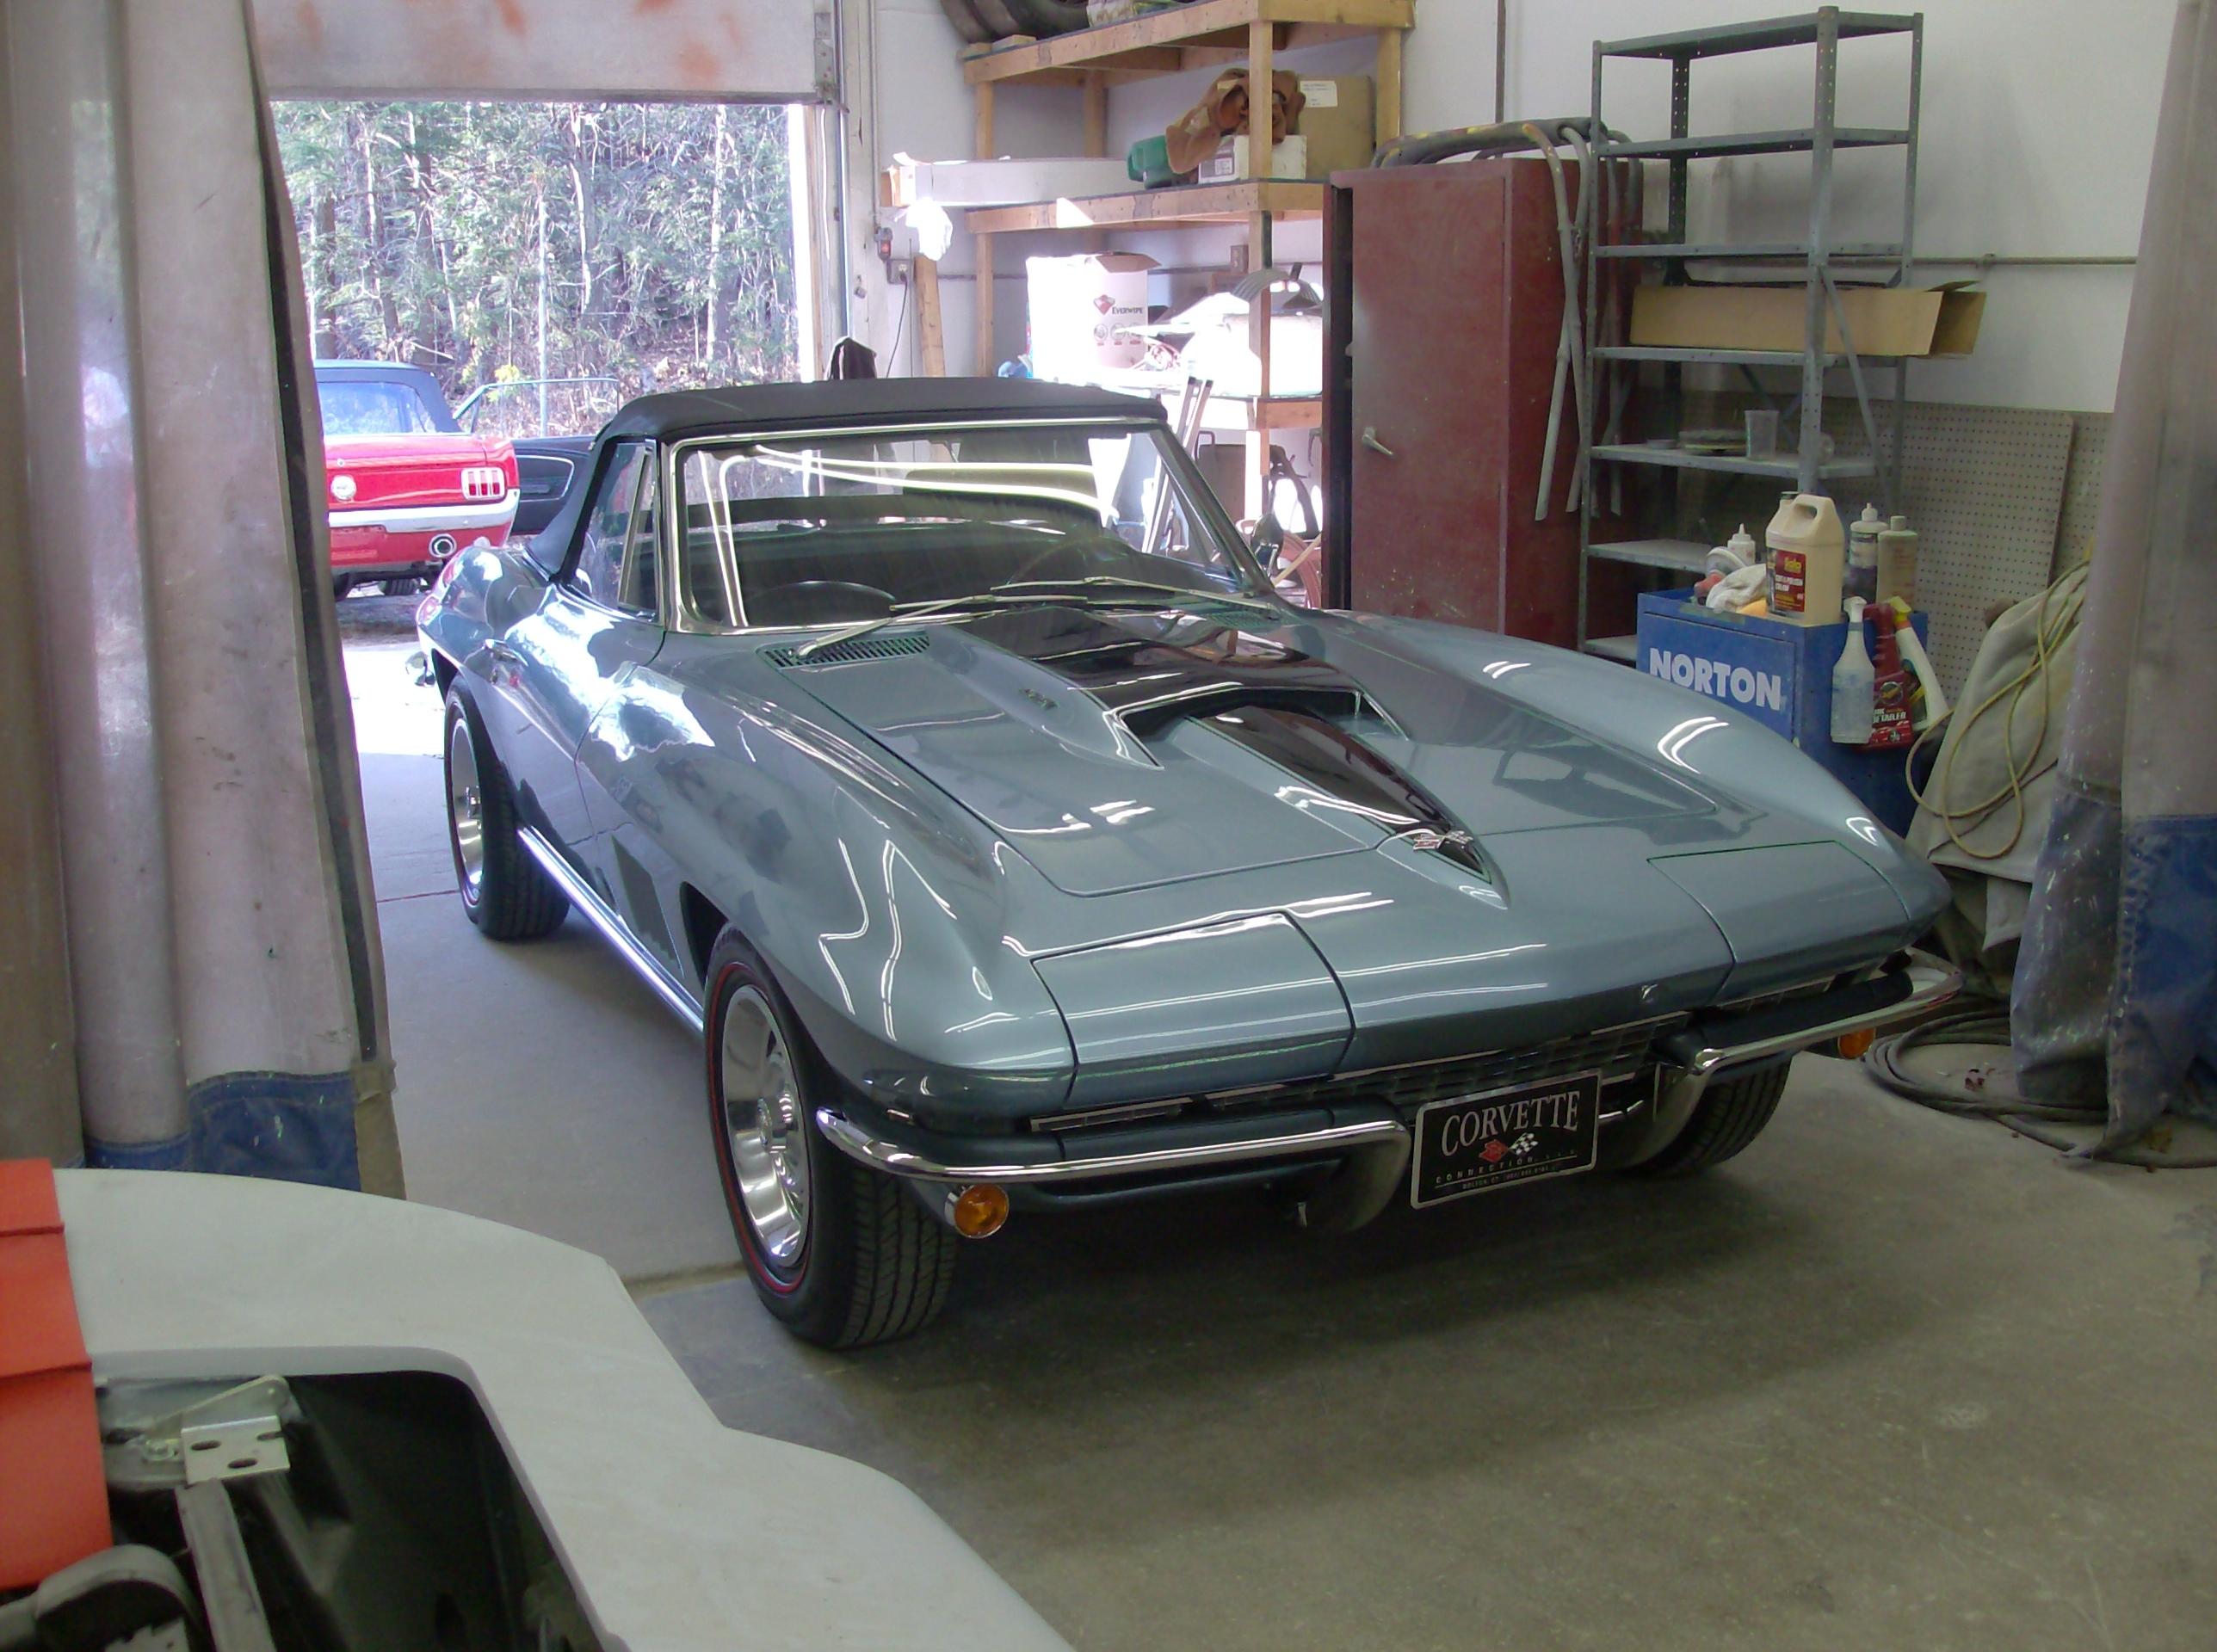 1967 Convertible Corvette